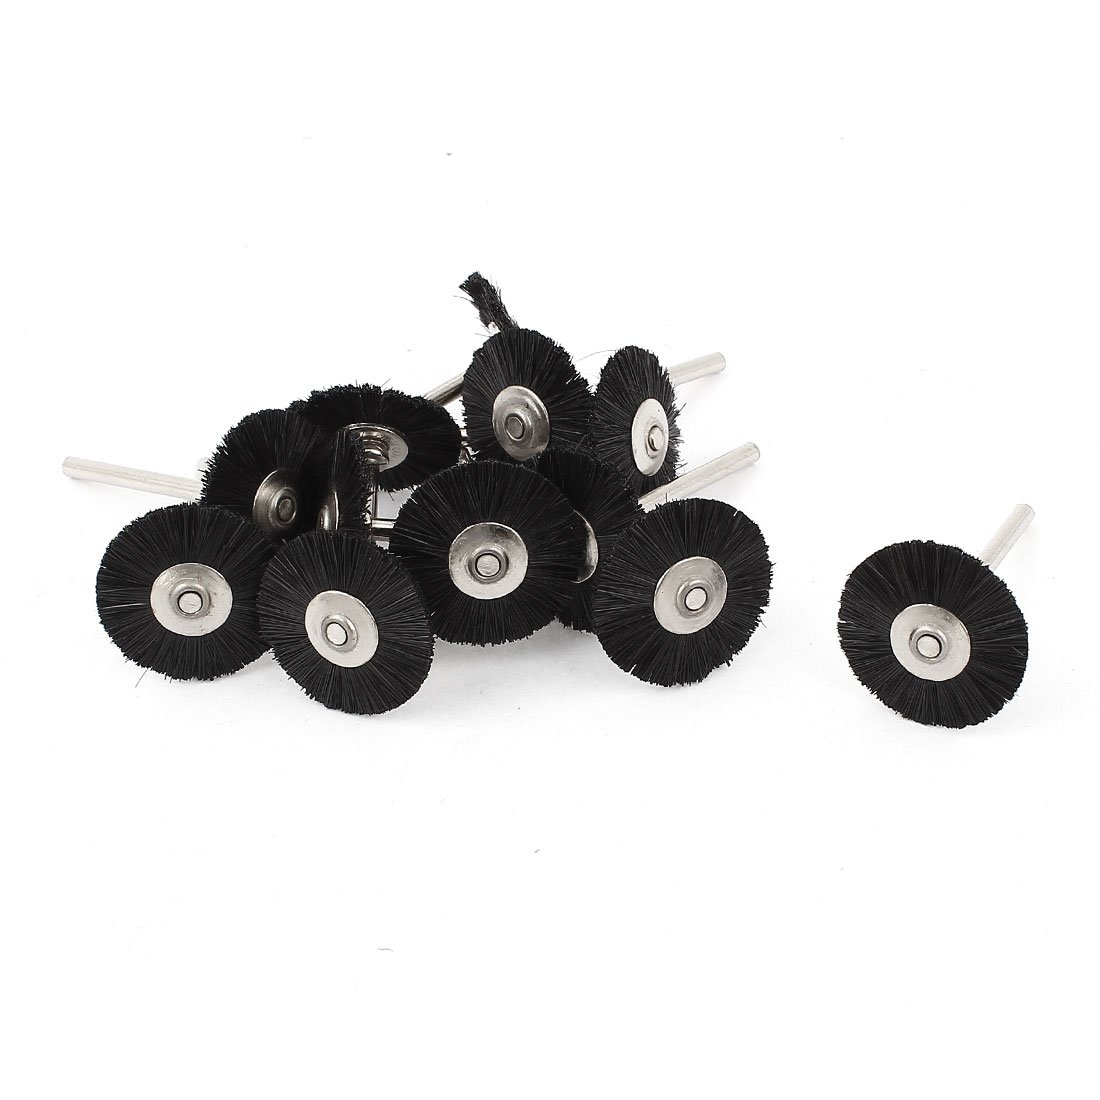 12x 1/8inch Shank 25mm Wheel Nylon Bristle Brush for Dremel Tool Sourcingmap a14090200ux0684